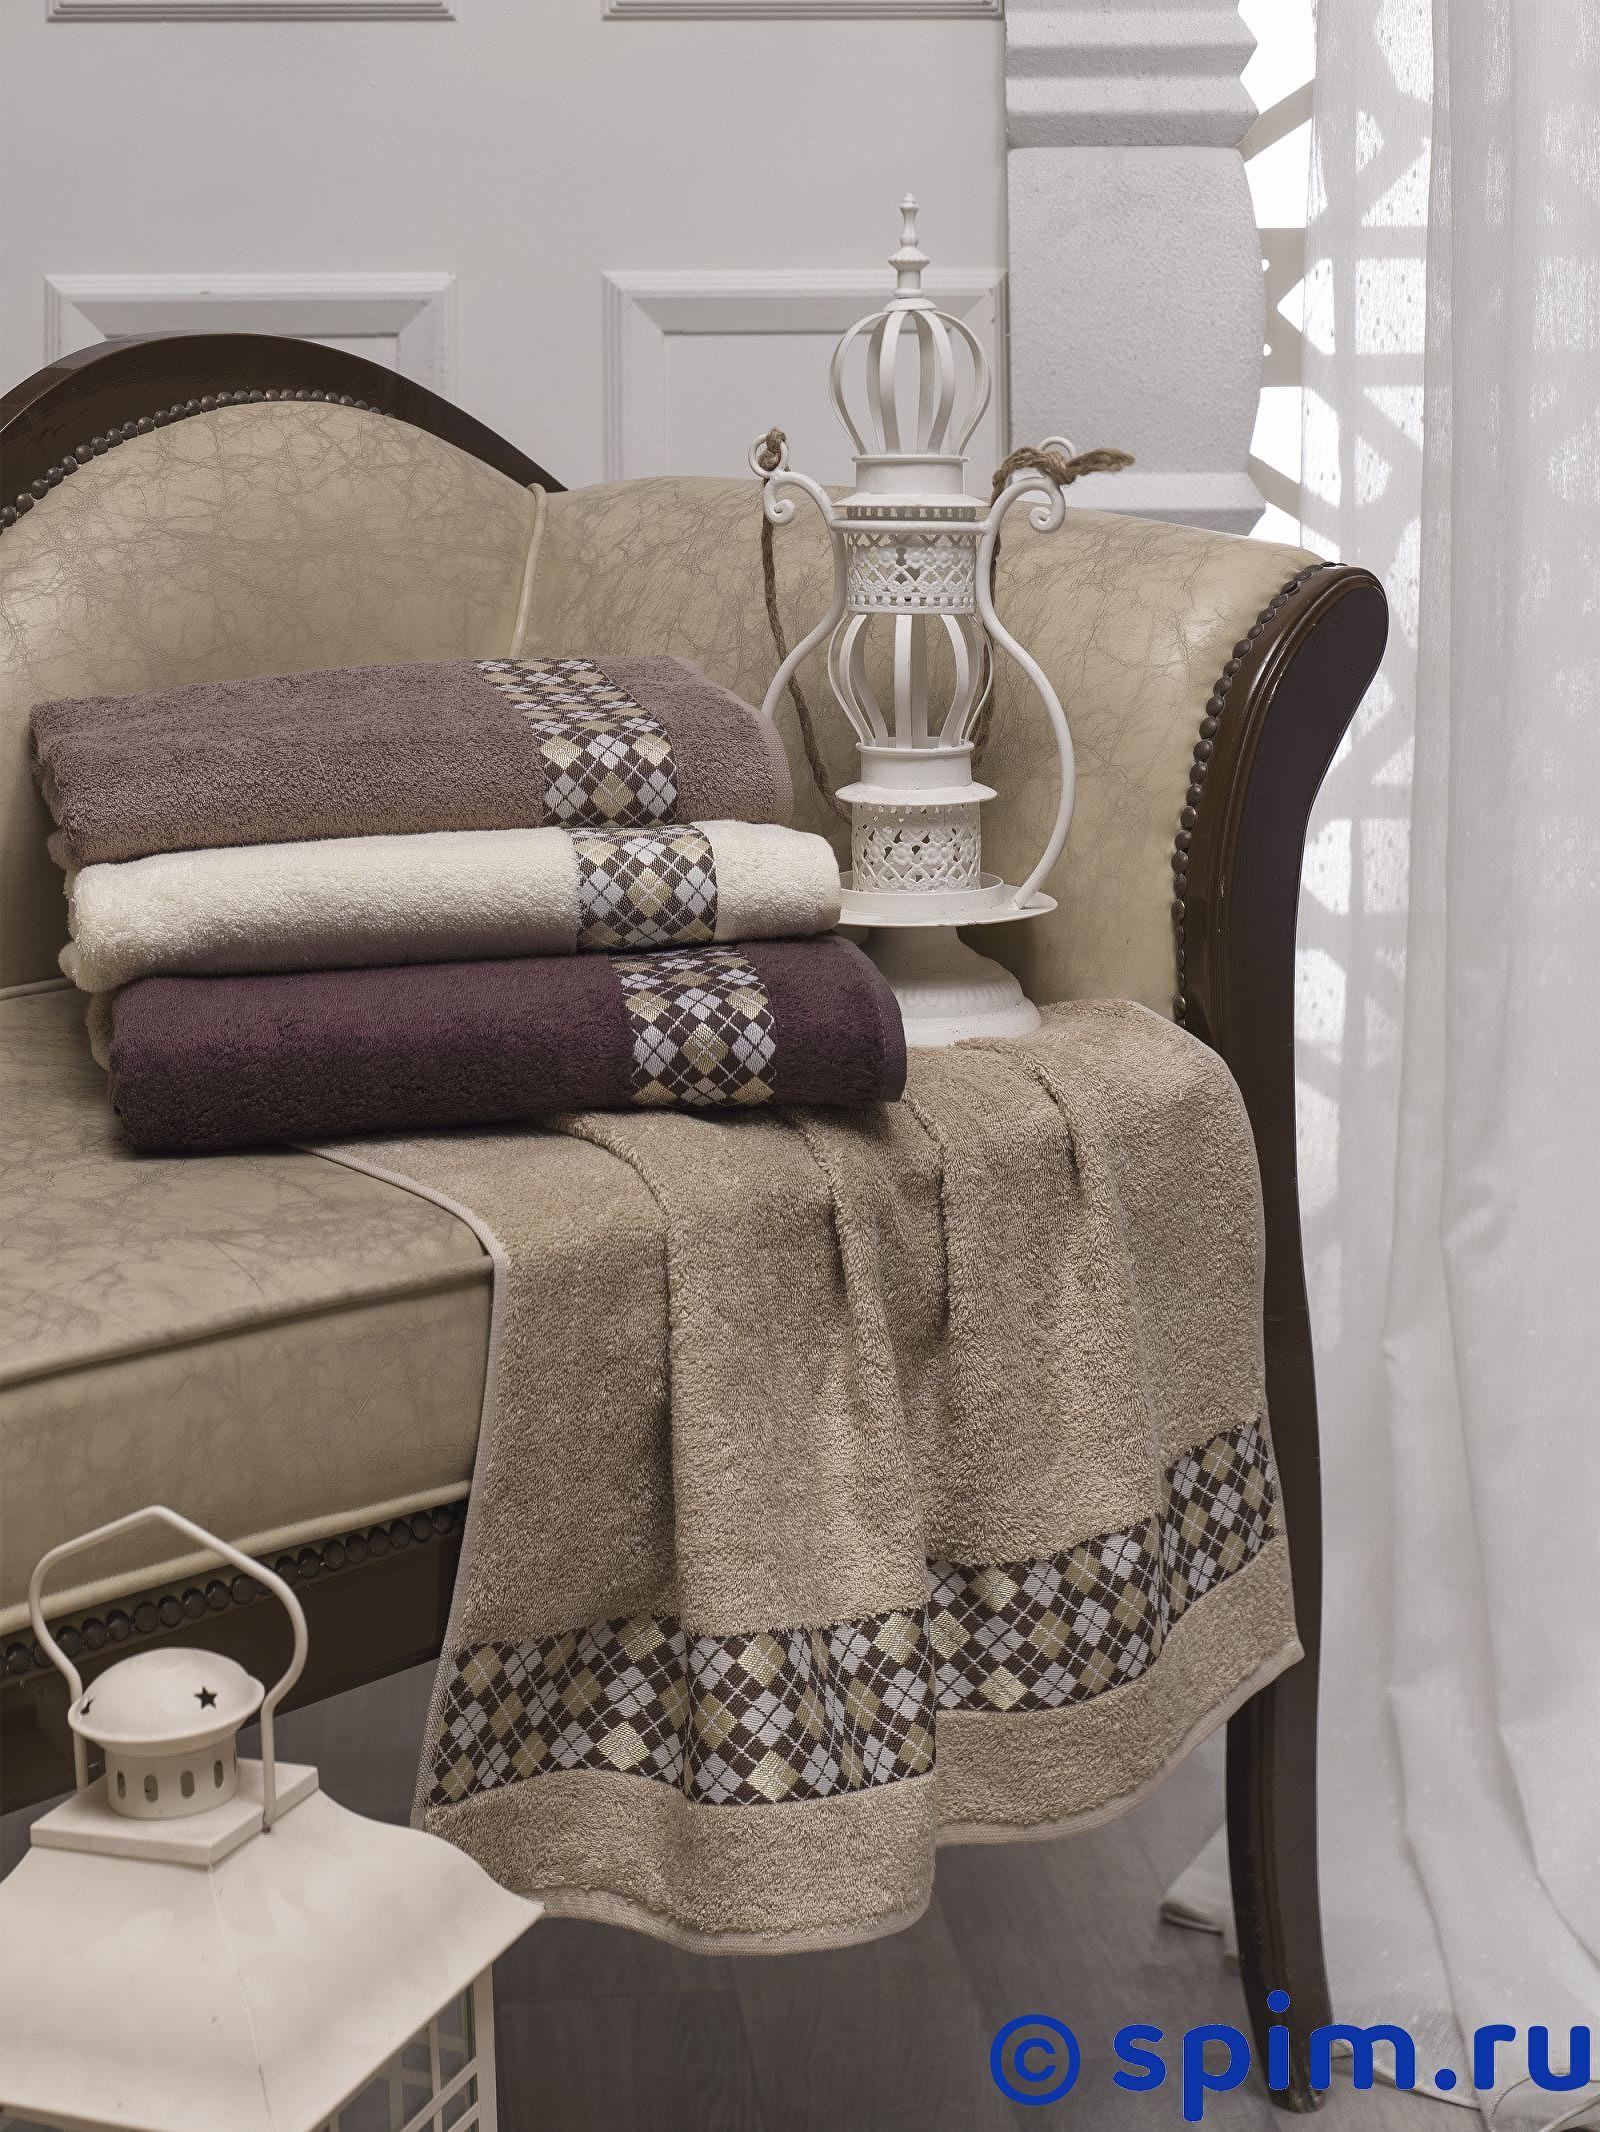 Набор из 4-х полотенец Do&co Ecose 70х140 см полотенца do n co полотенце lady цвет мятный набор